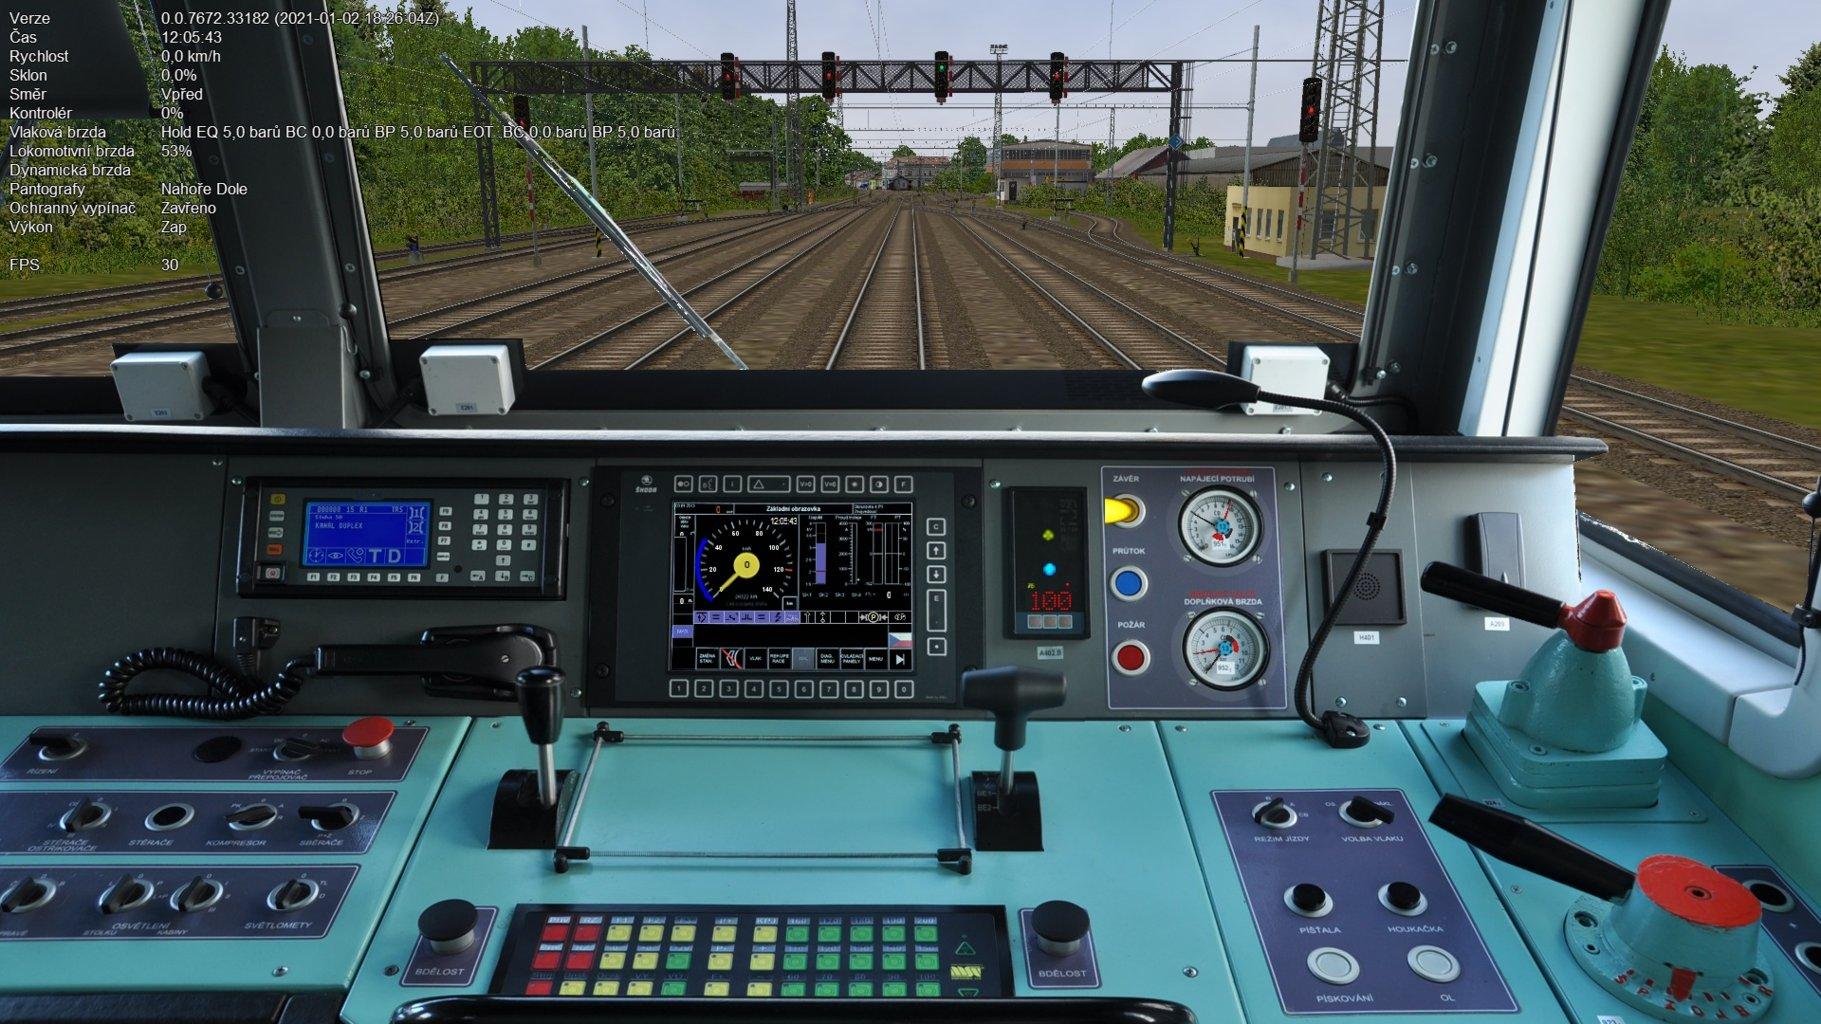 Open Rails 2021-01-26 08-50-18.jpg